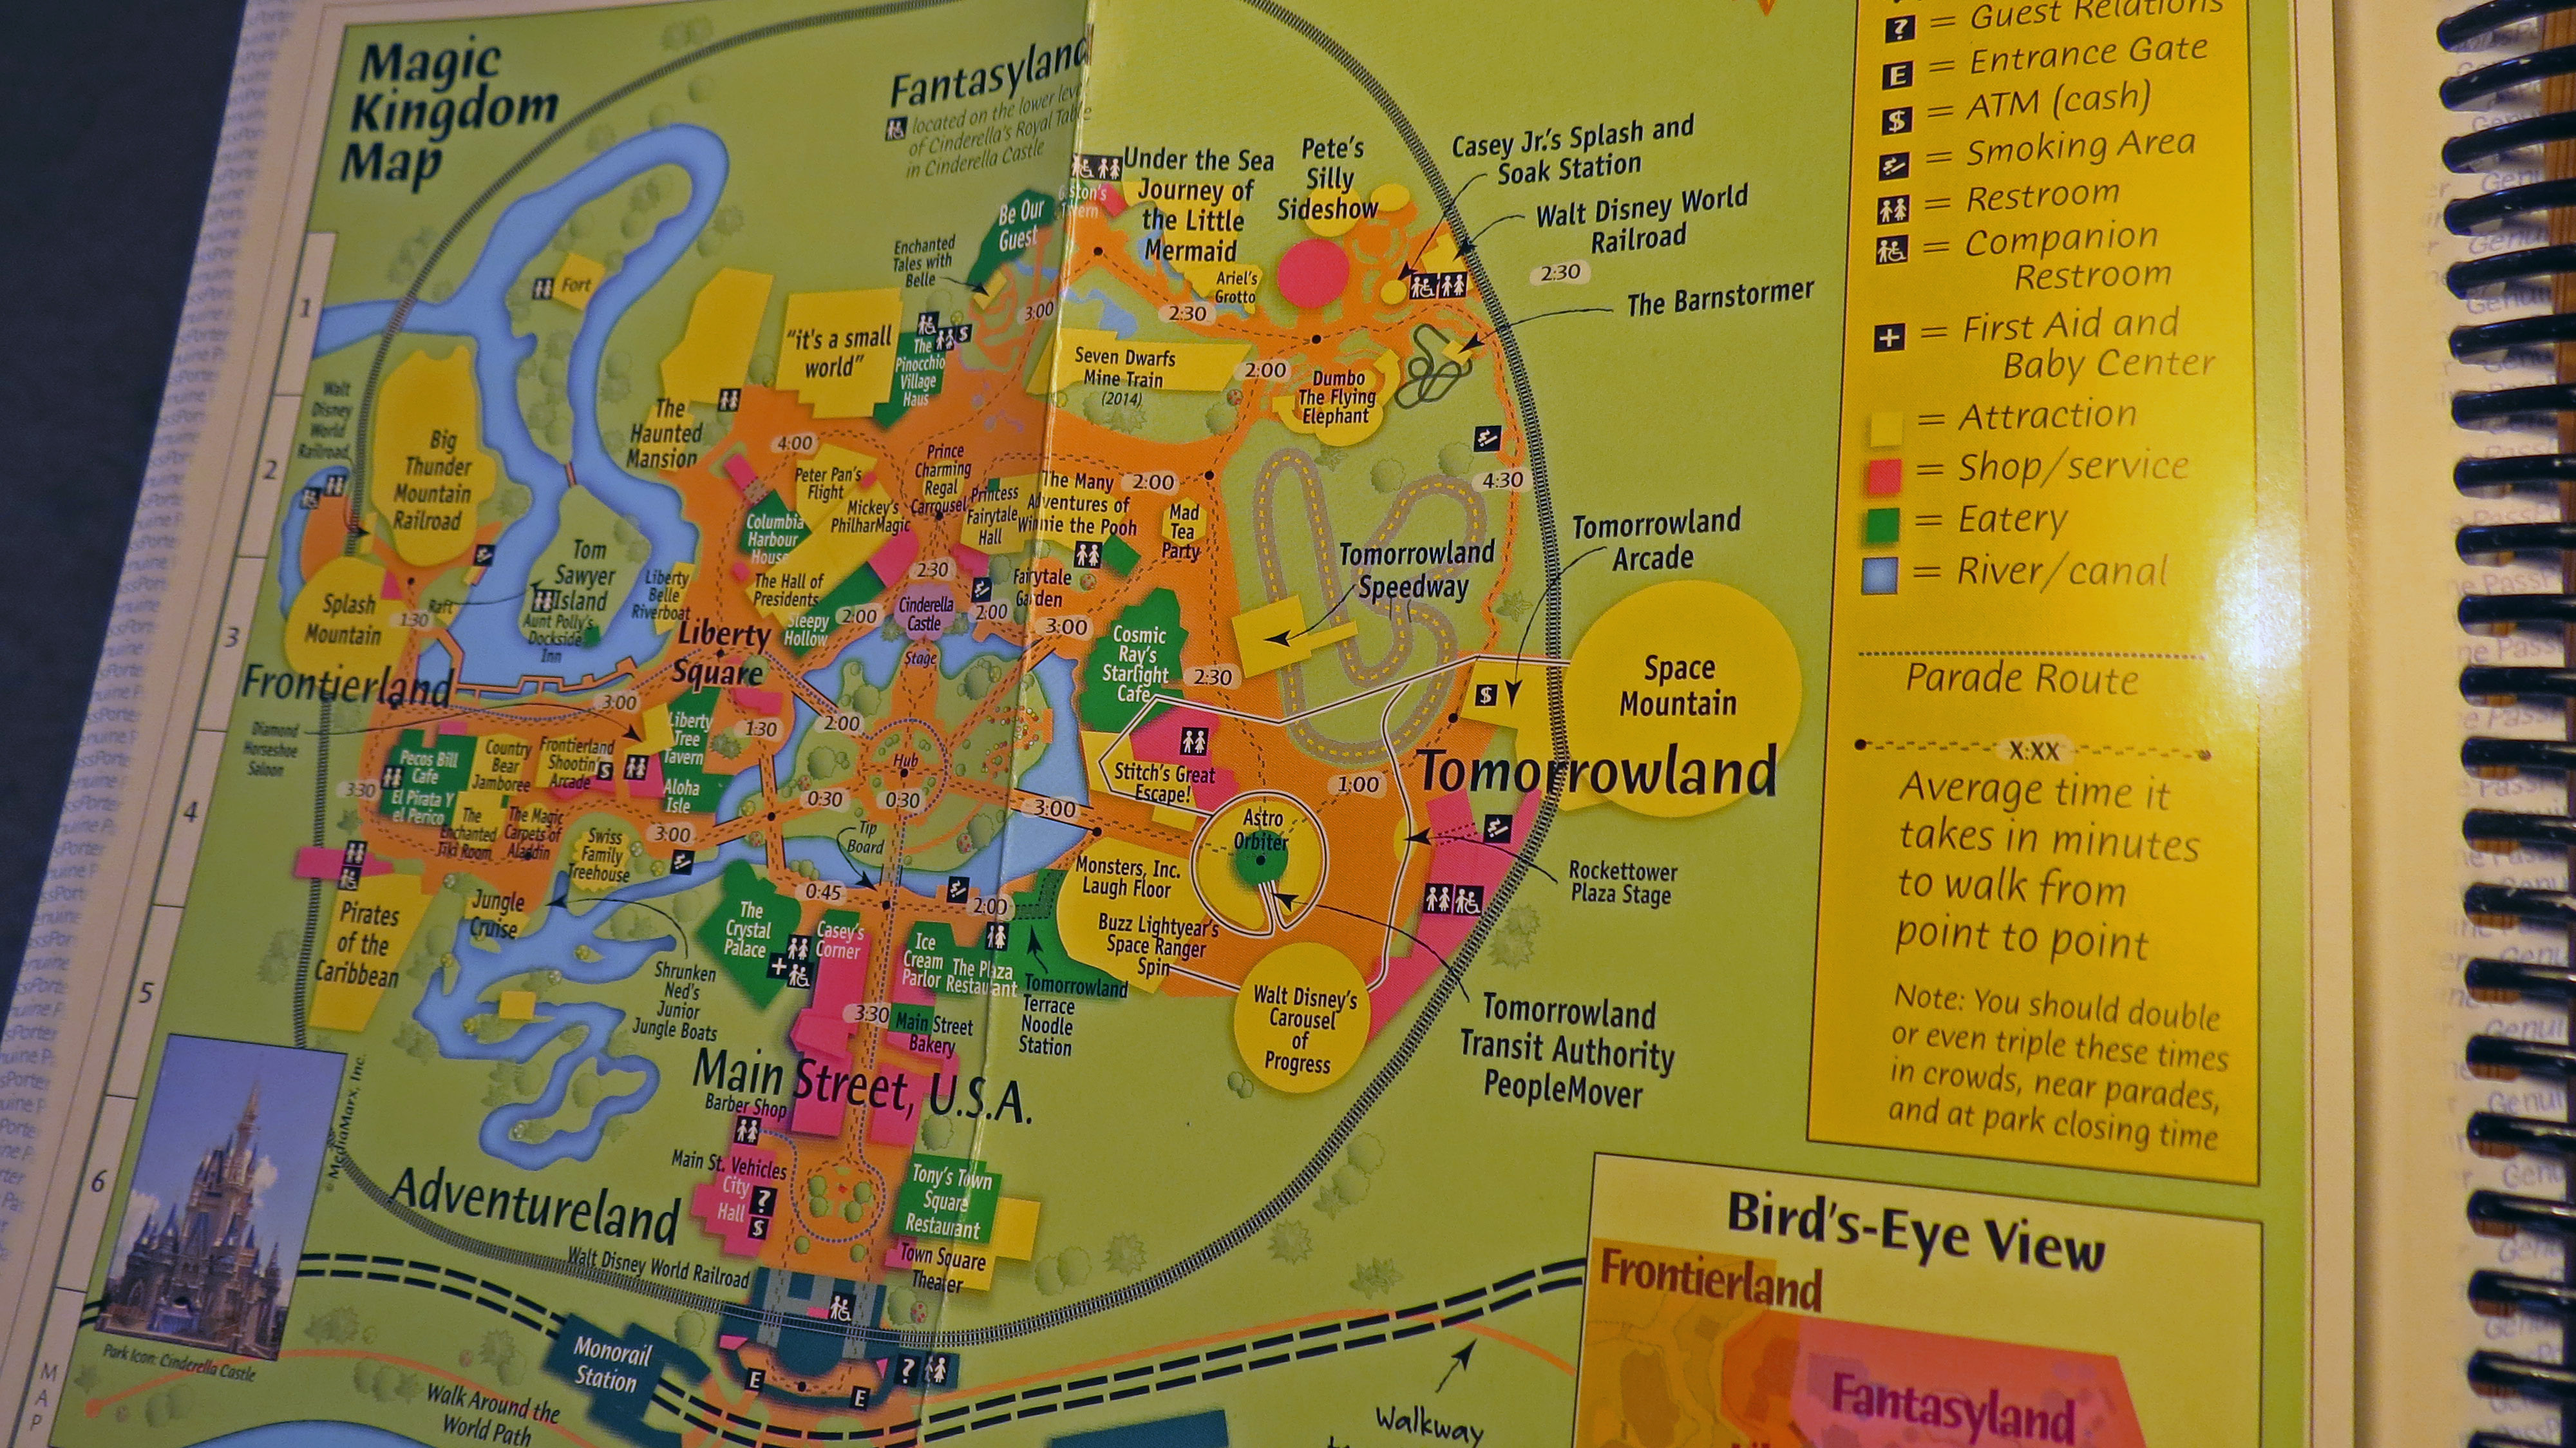 Passporter S Walt Disney World Travel Guide Best Guide